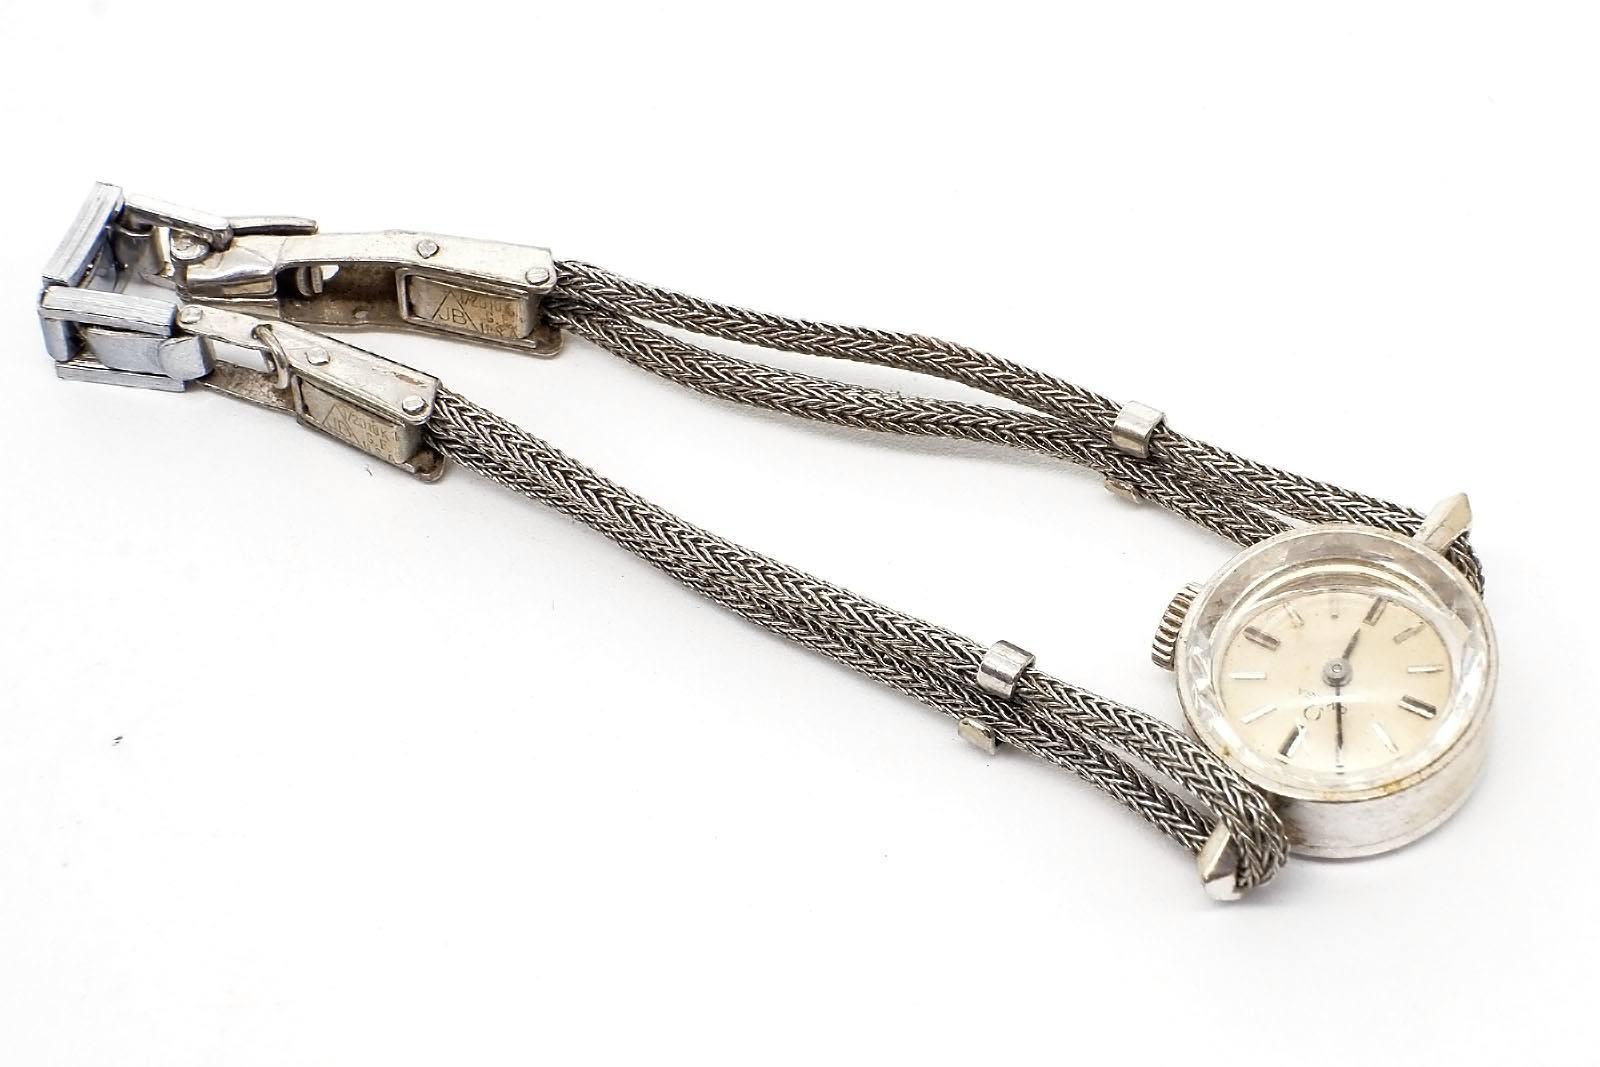 '14ct White Gold Cased Omega Ladies Wrist Watch'